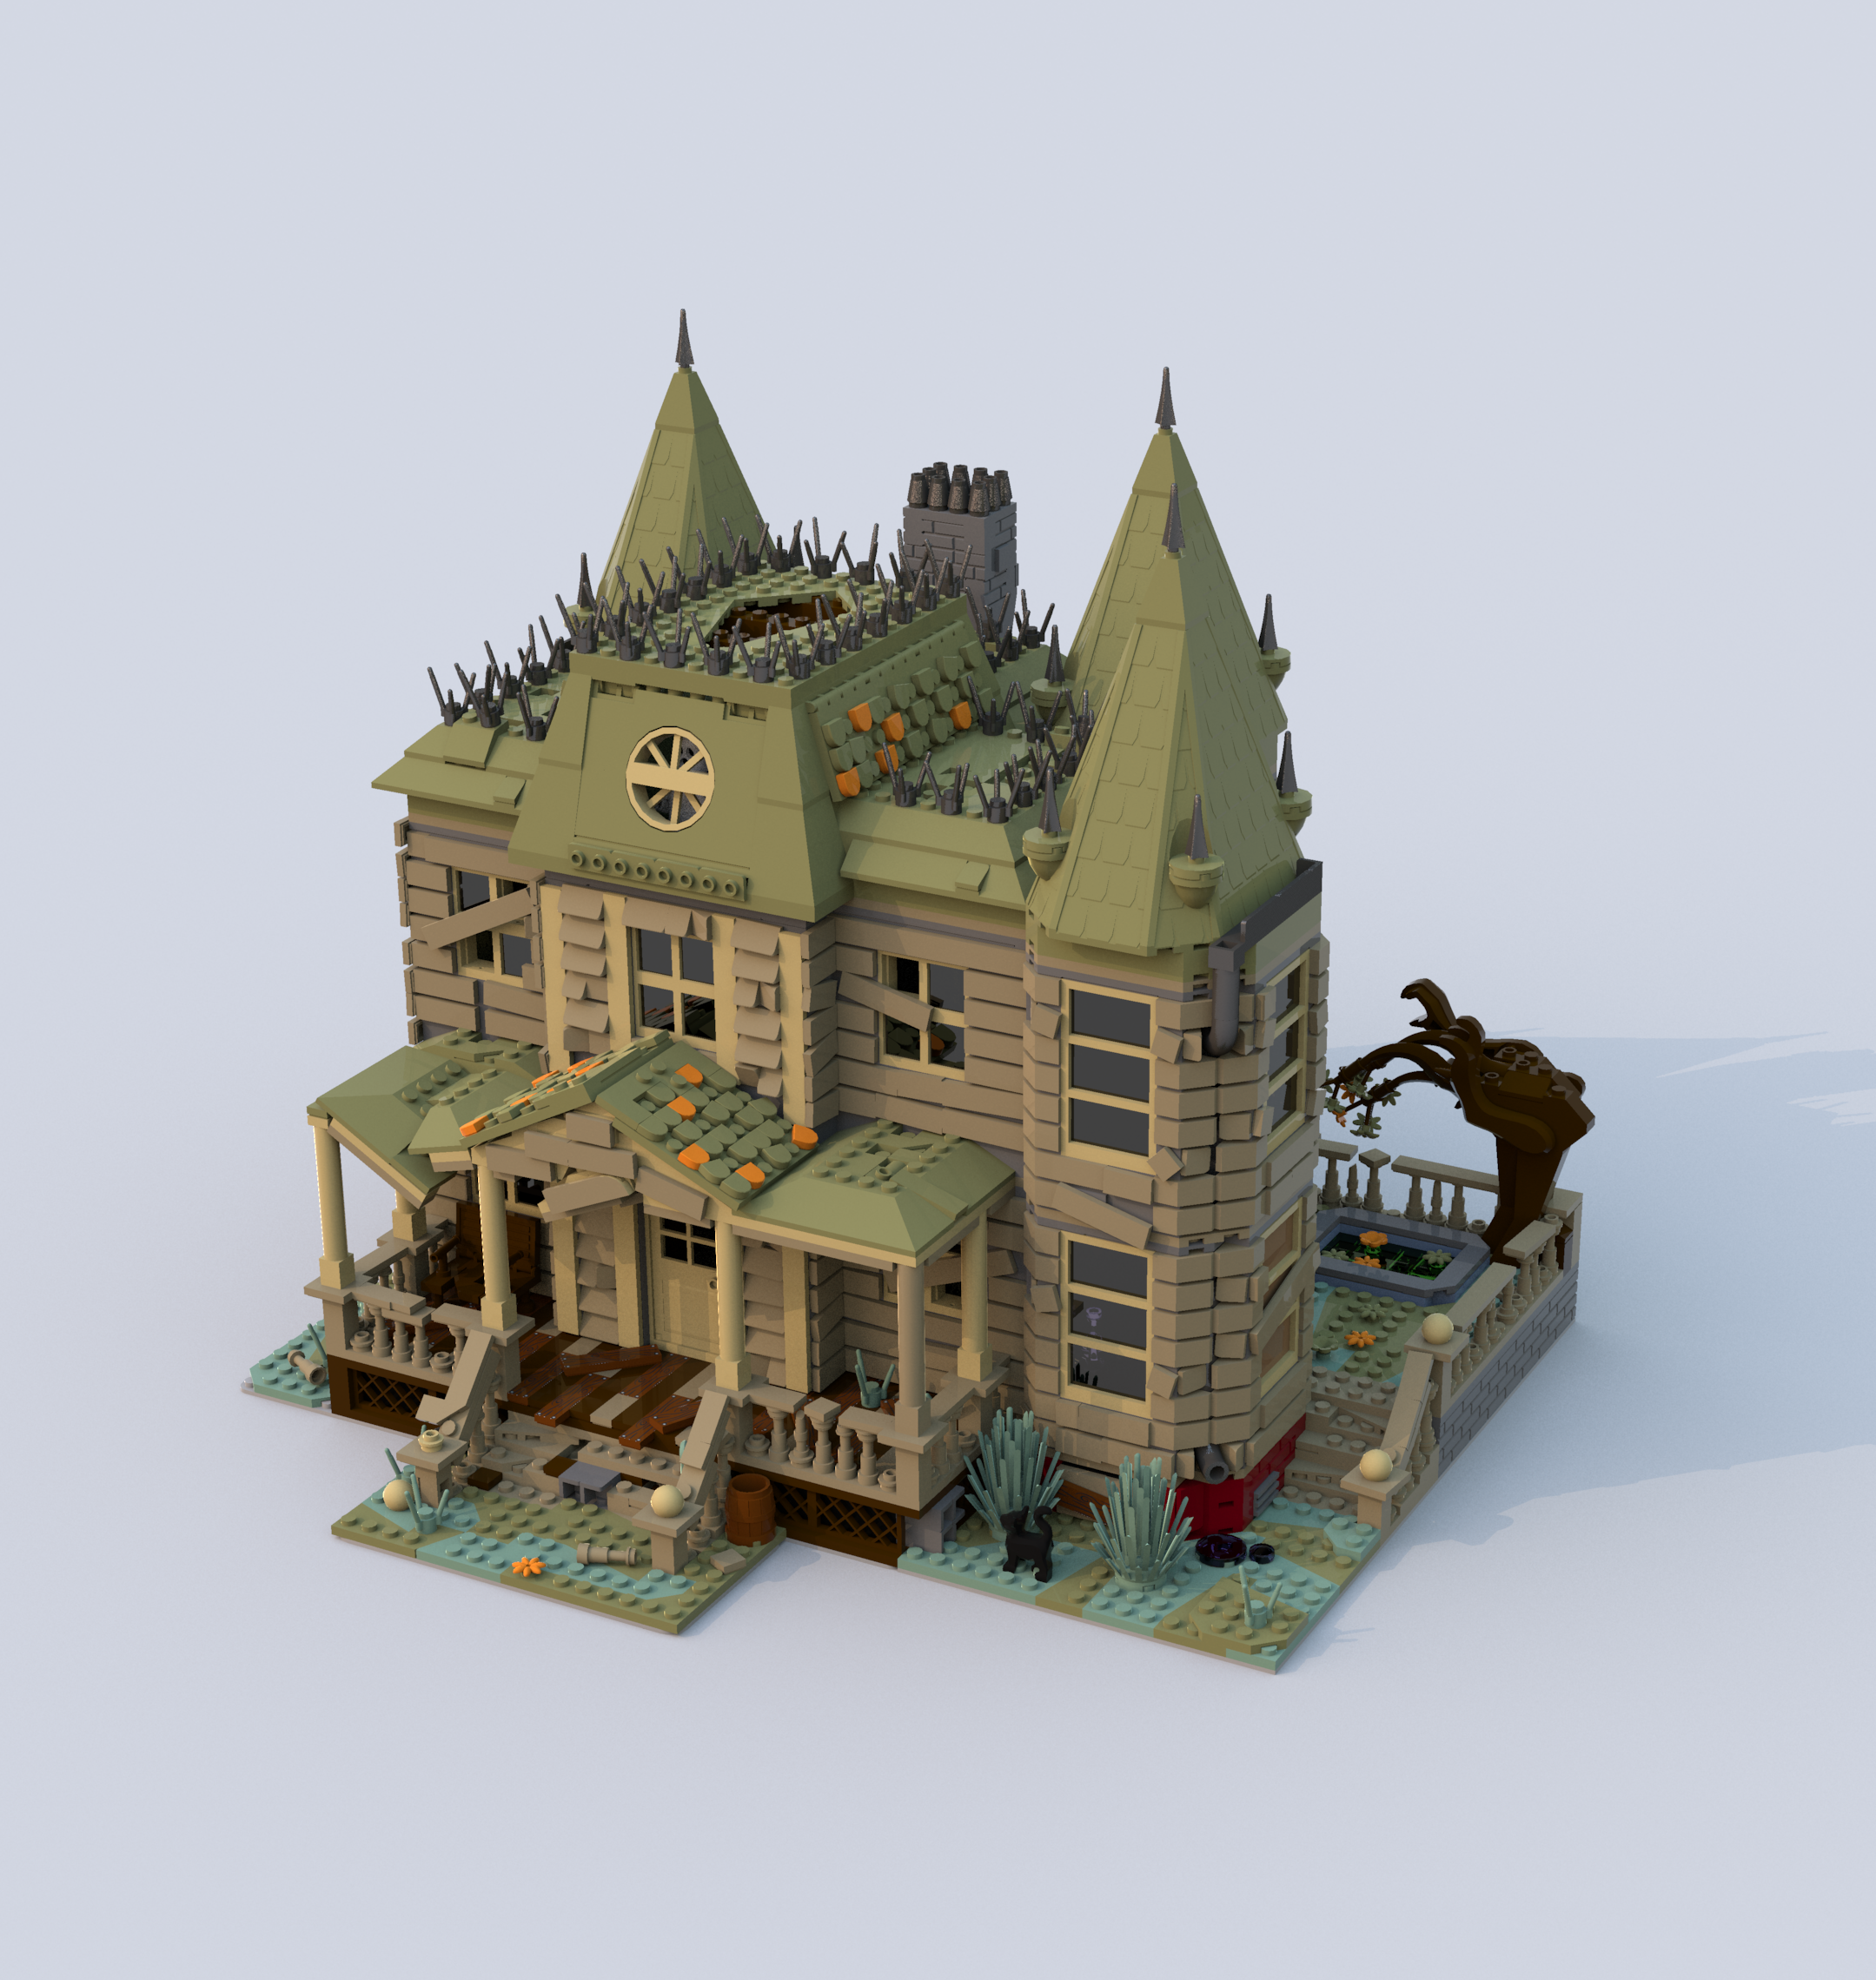 Modular Old House Lego Haunted House Lego House Lego Halloween